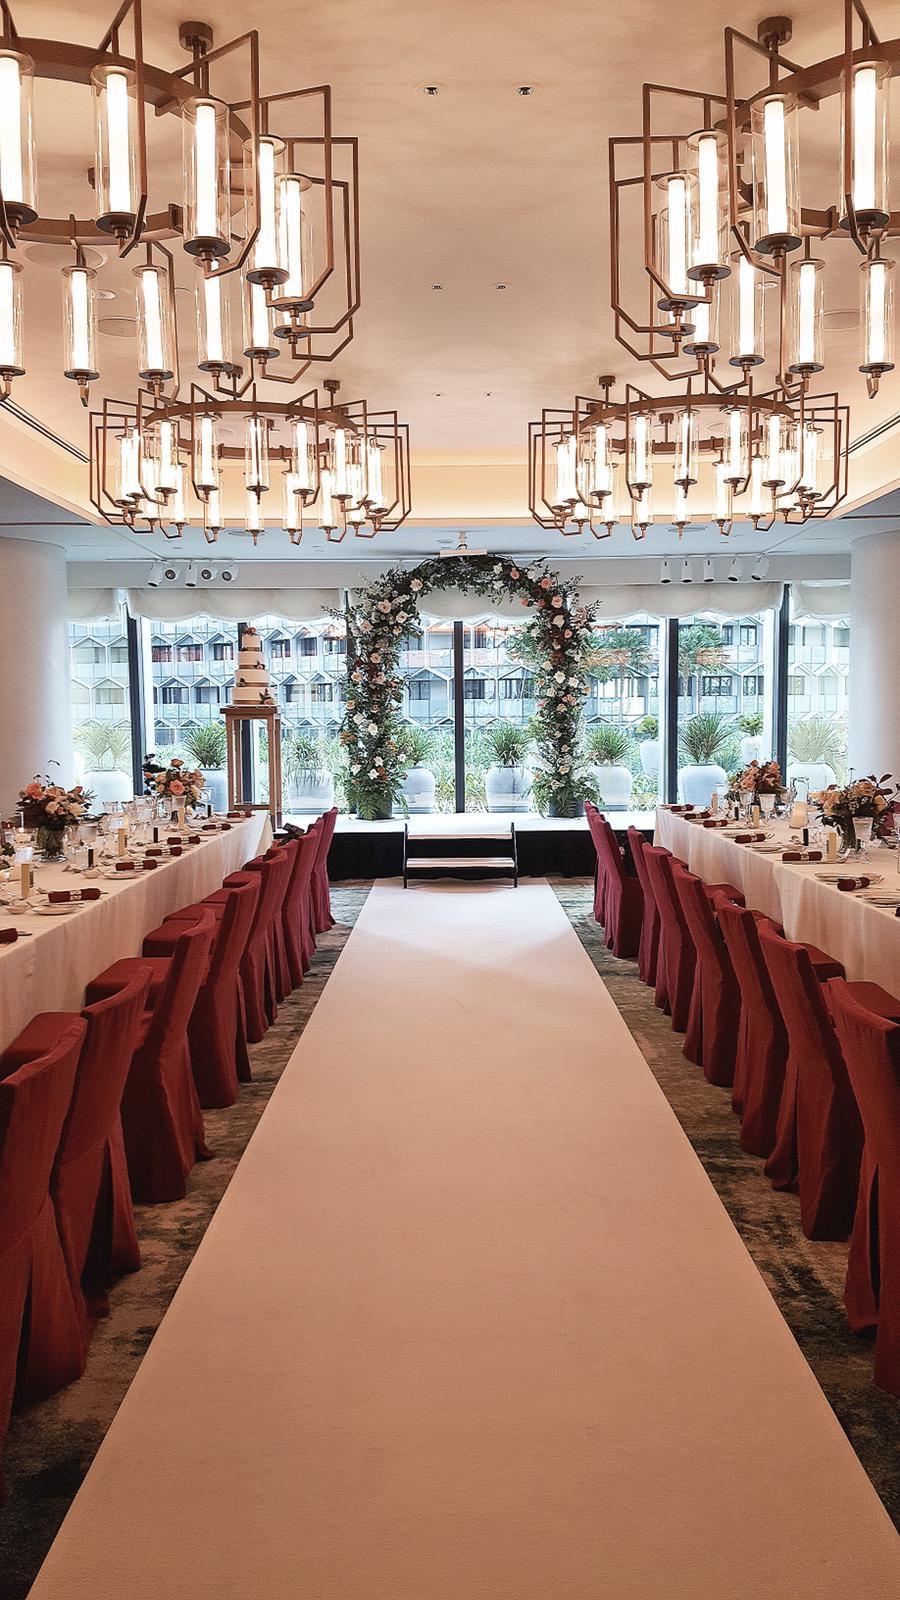 pc: everitts wedding